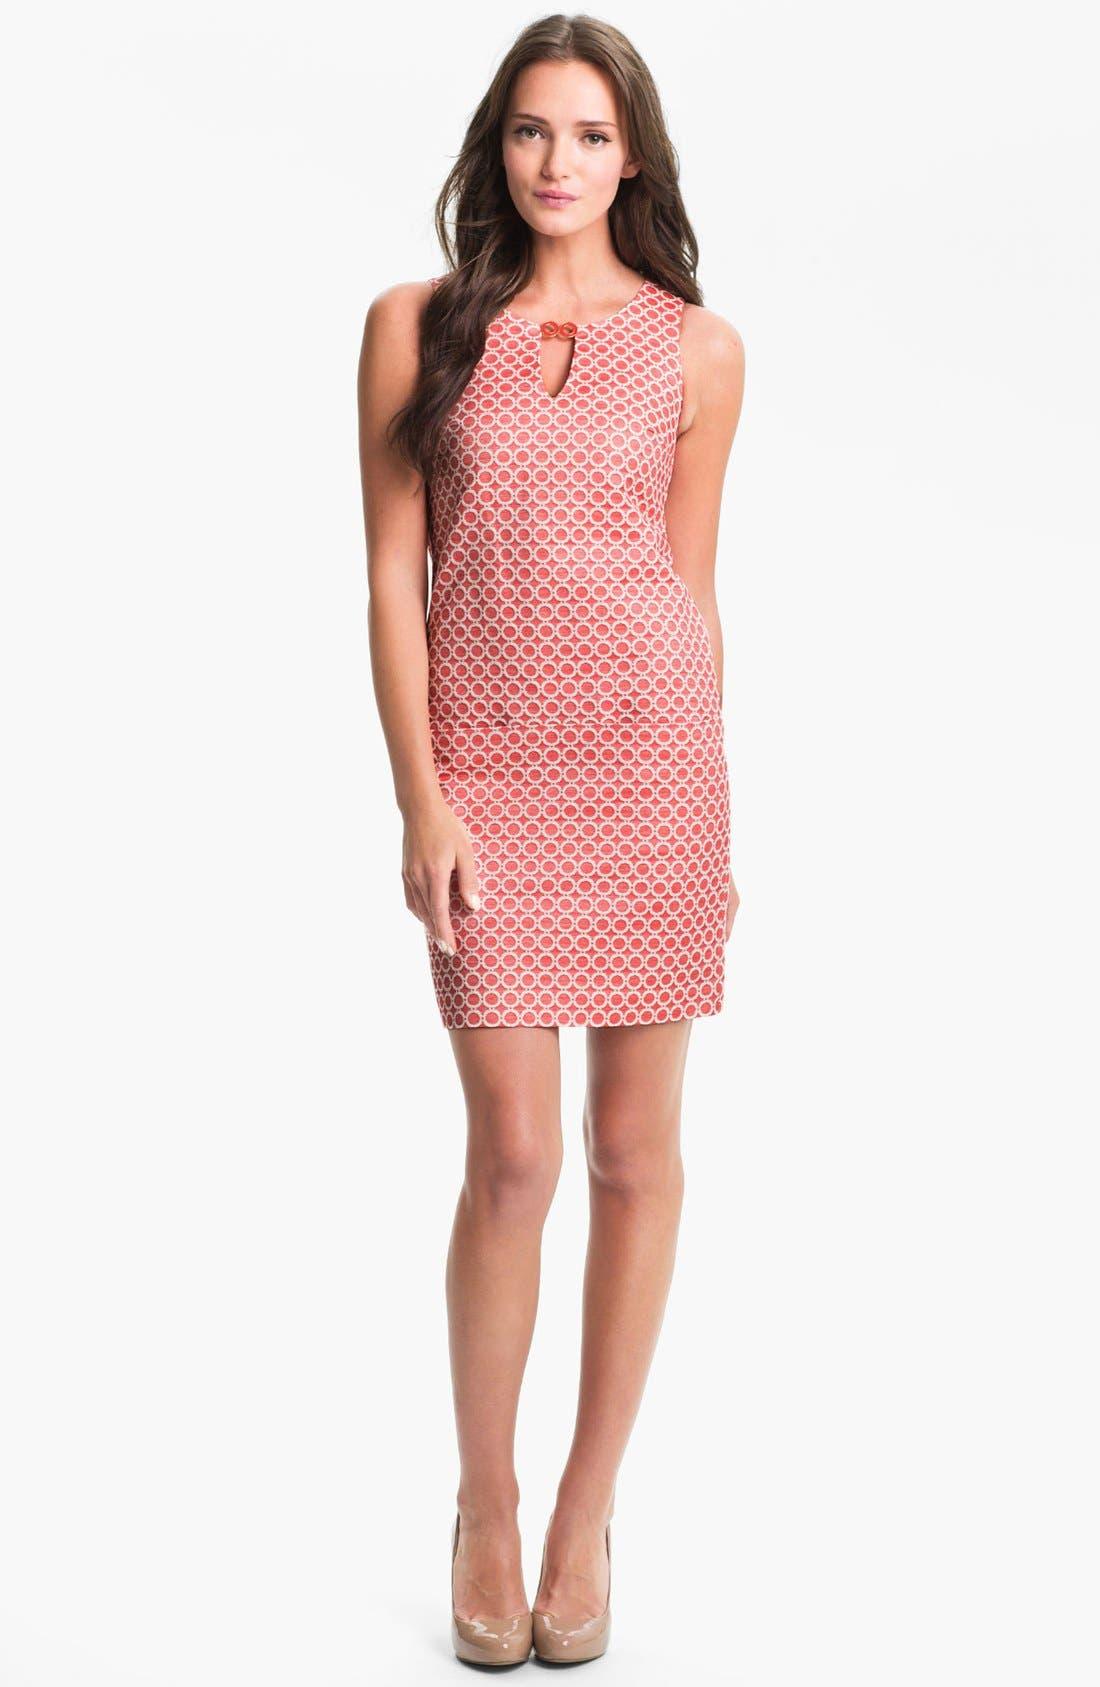 Main Image - Trina Turk 'Pro' Print Shift Dress